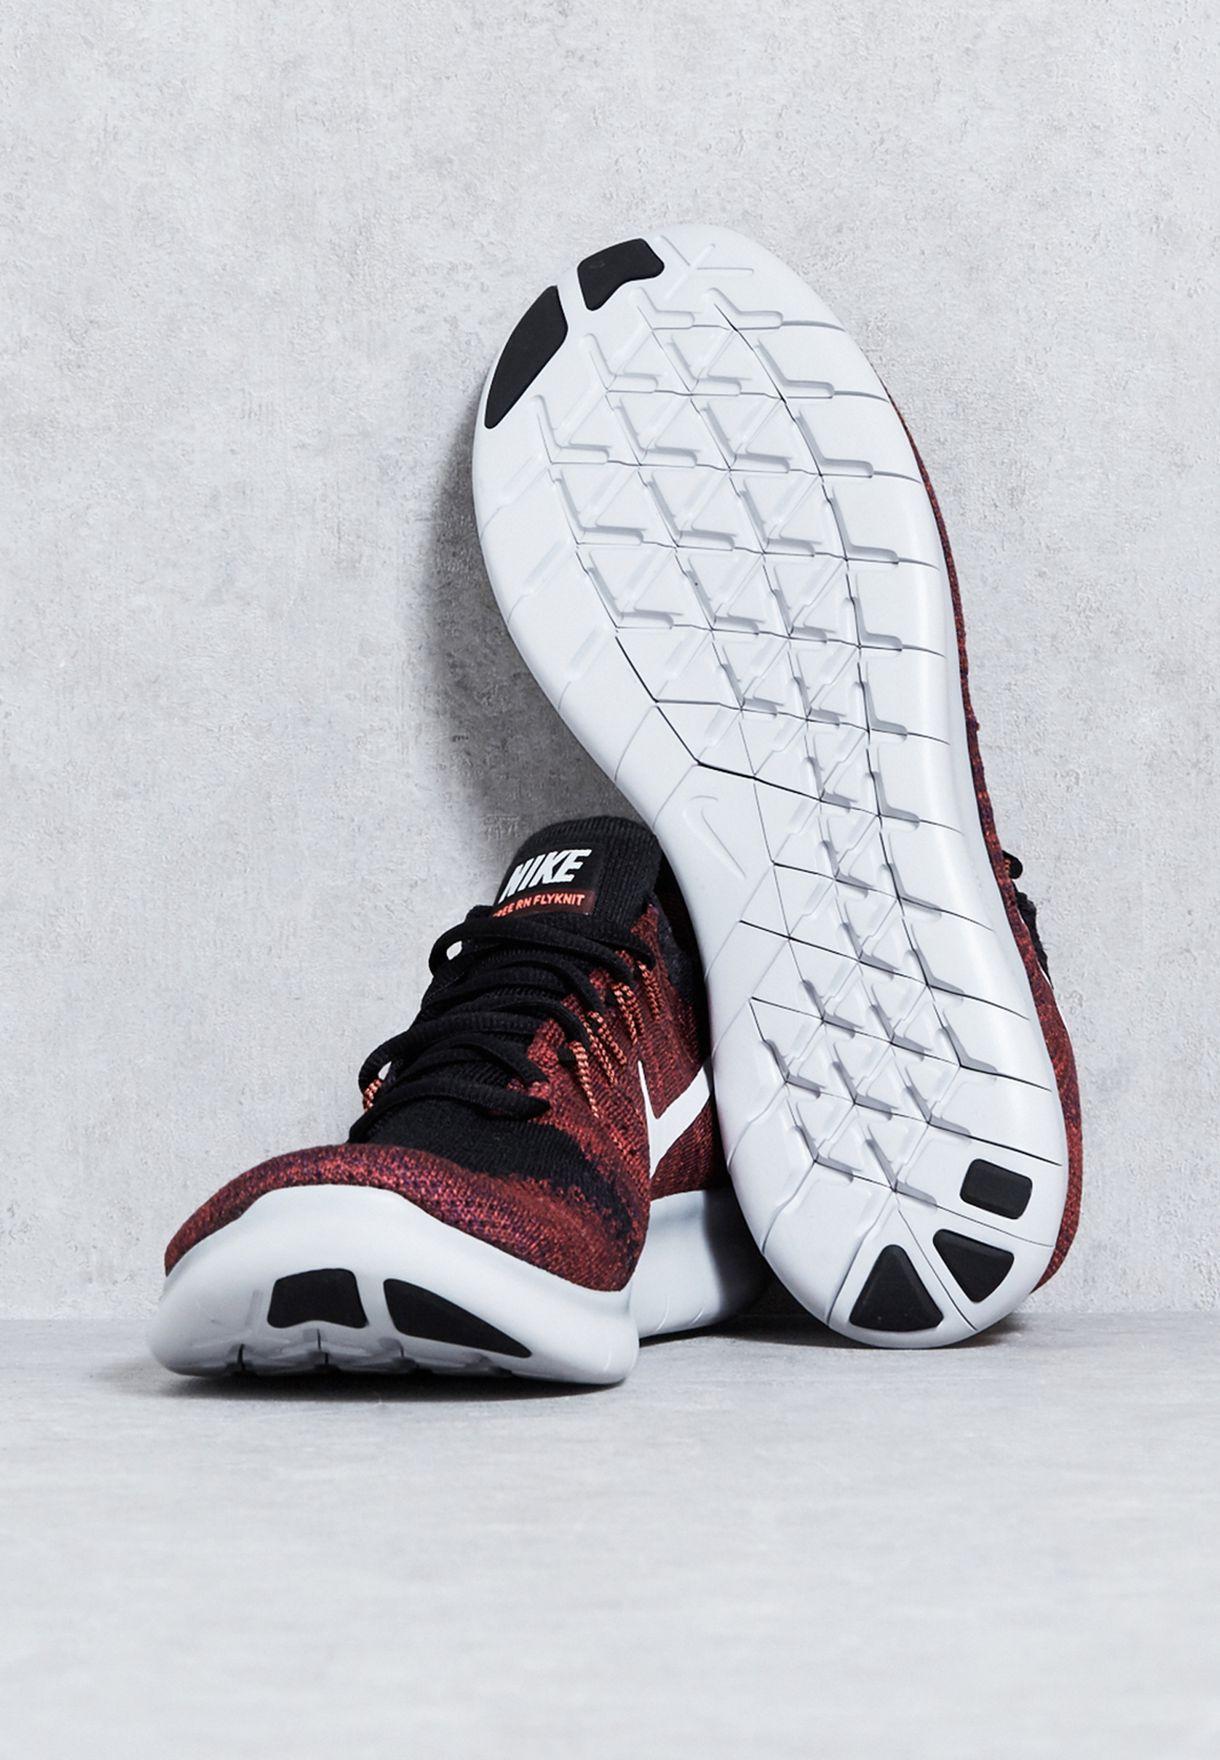 1a5a29c80a06f Shop Nike multicolor Free RN Flyknit 2 880843-006 for Men in UAE ...